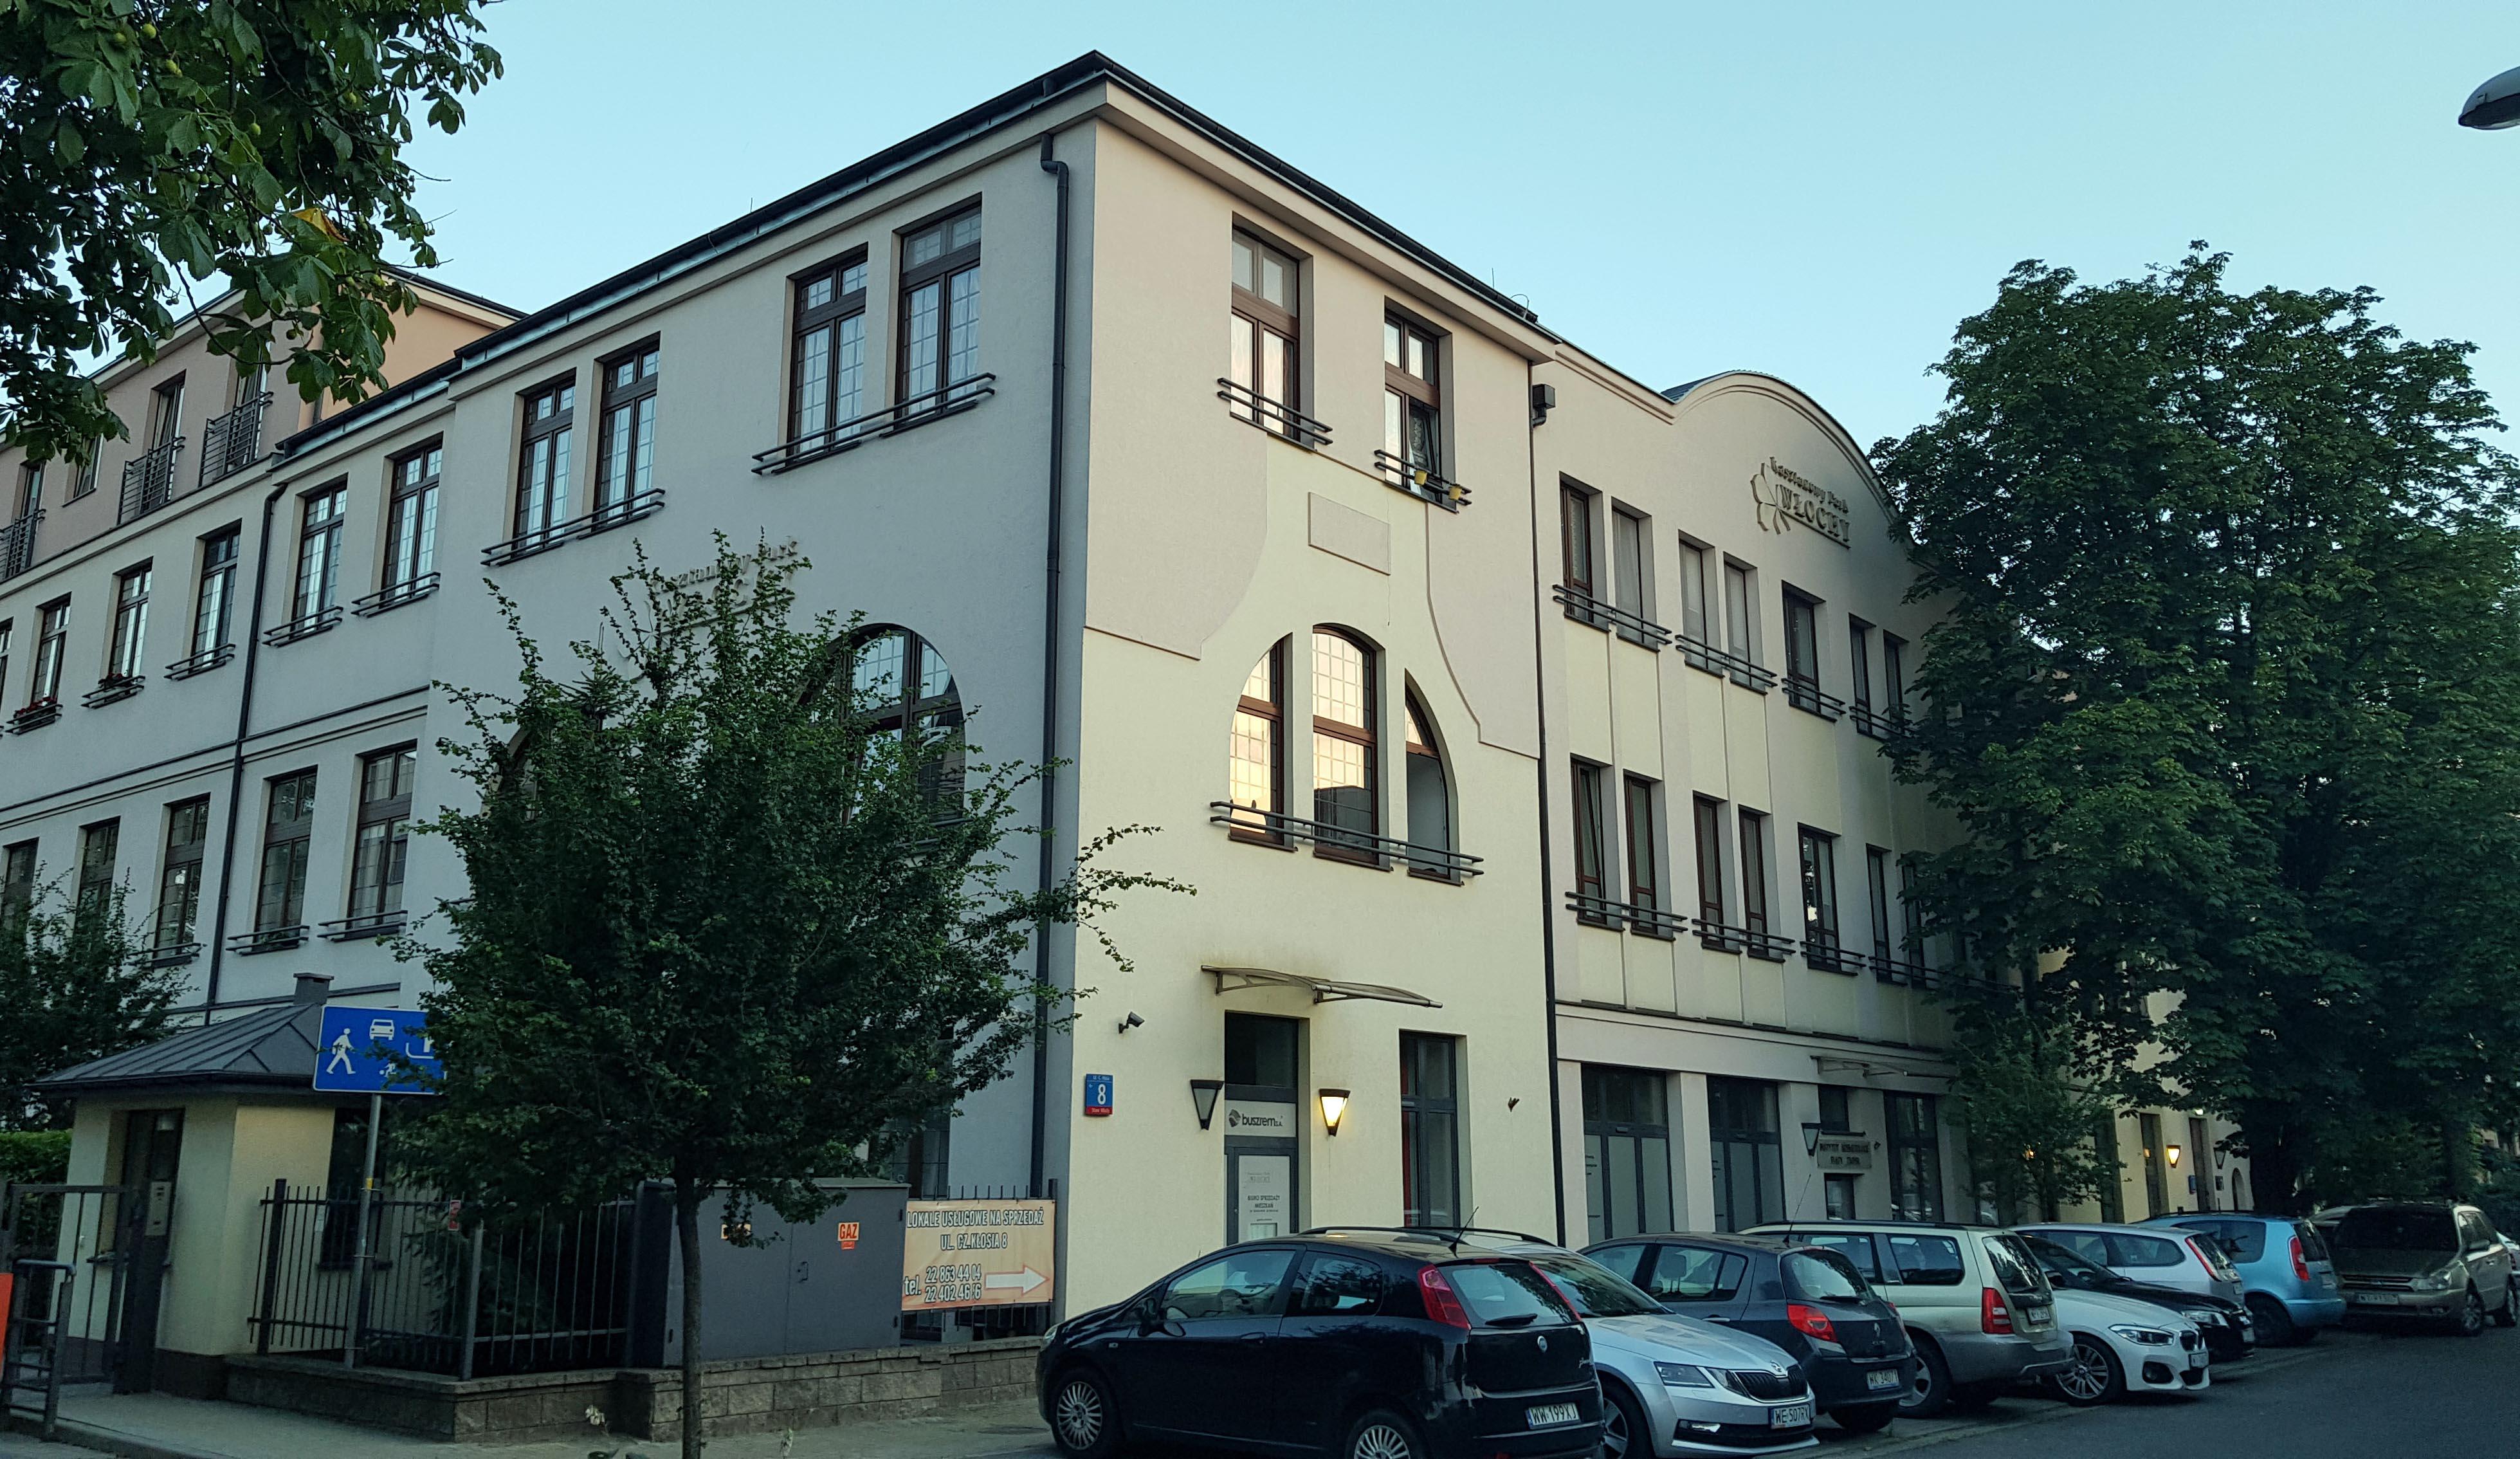 Fabryka Wlochy